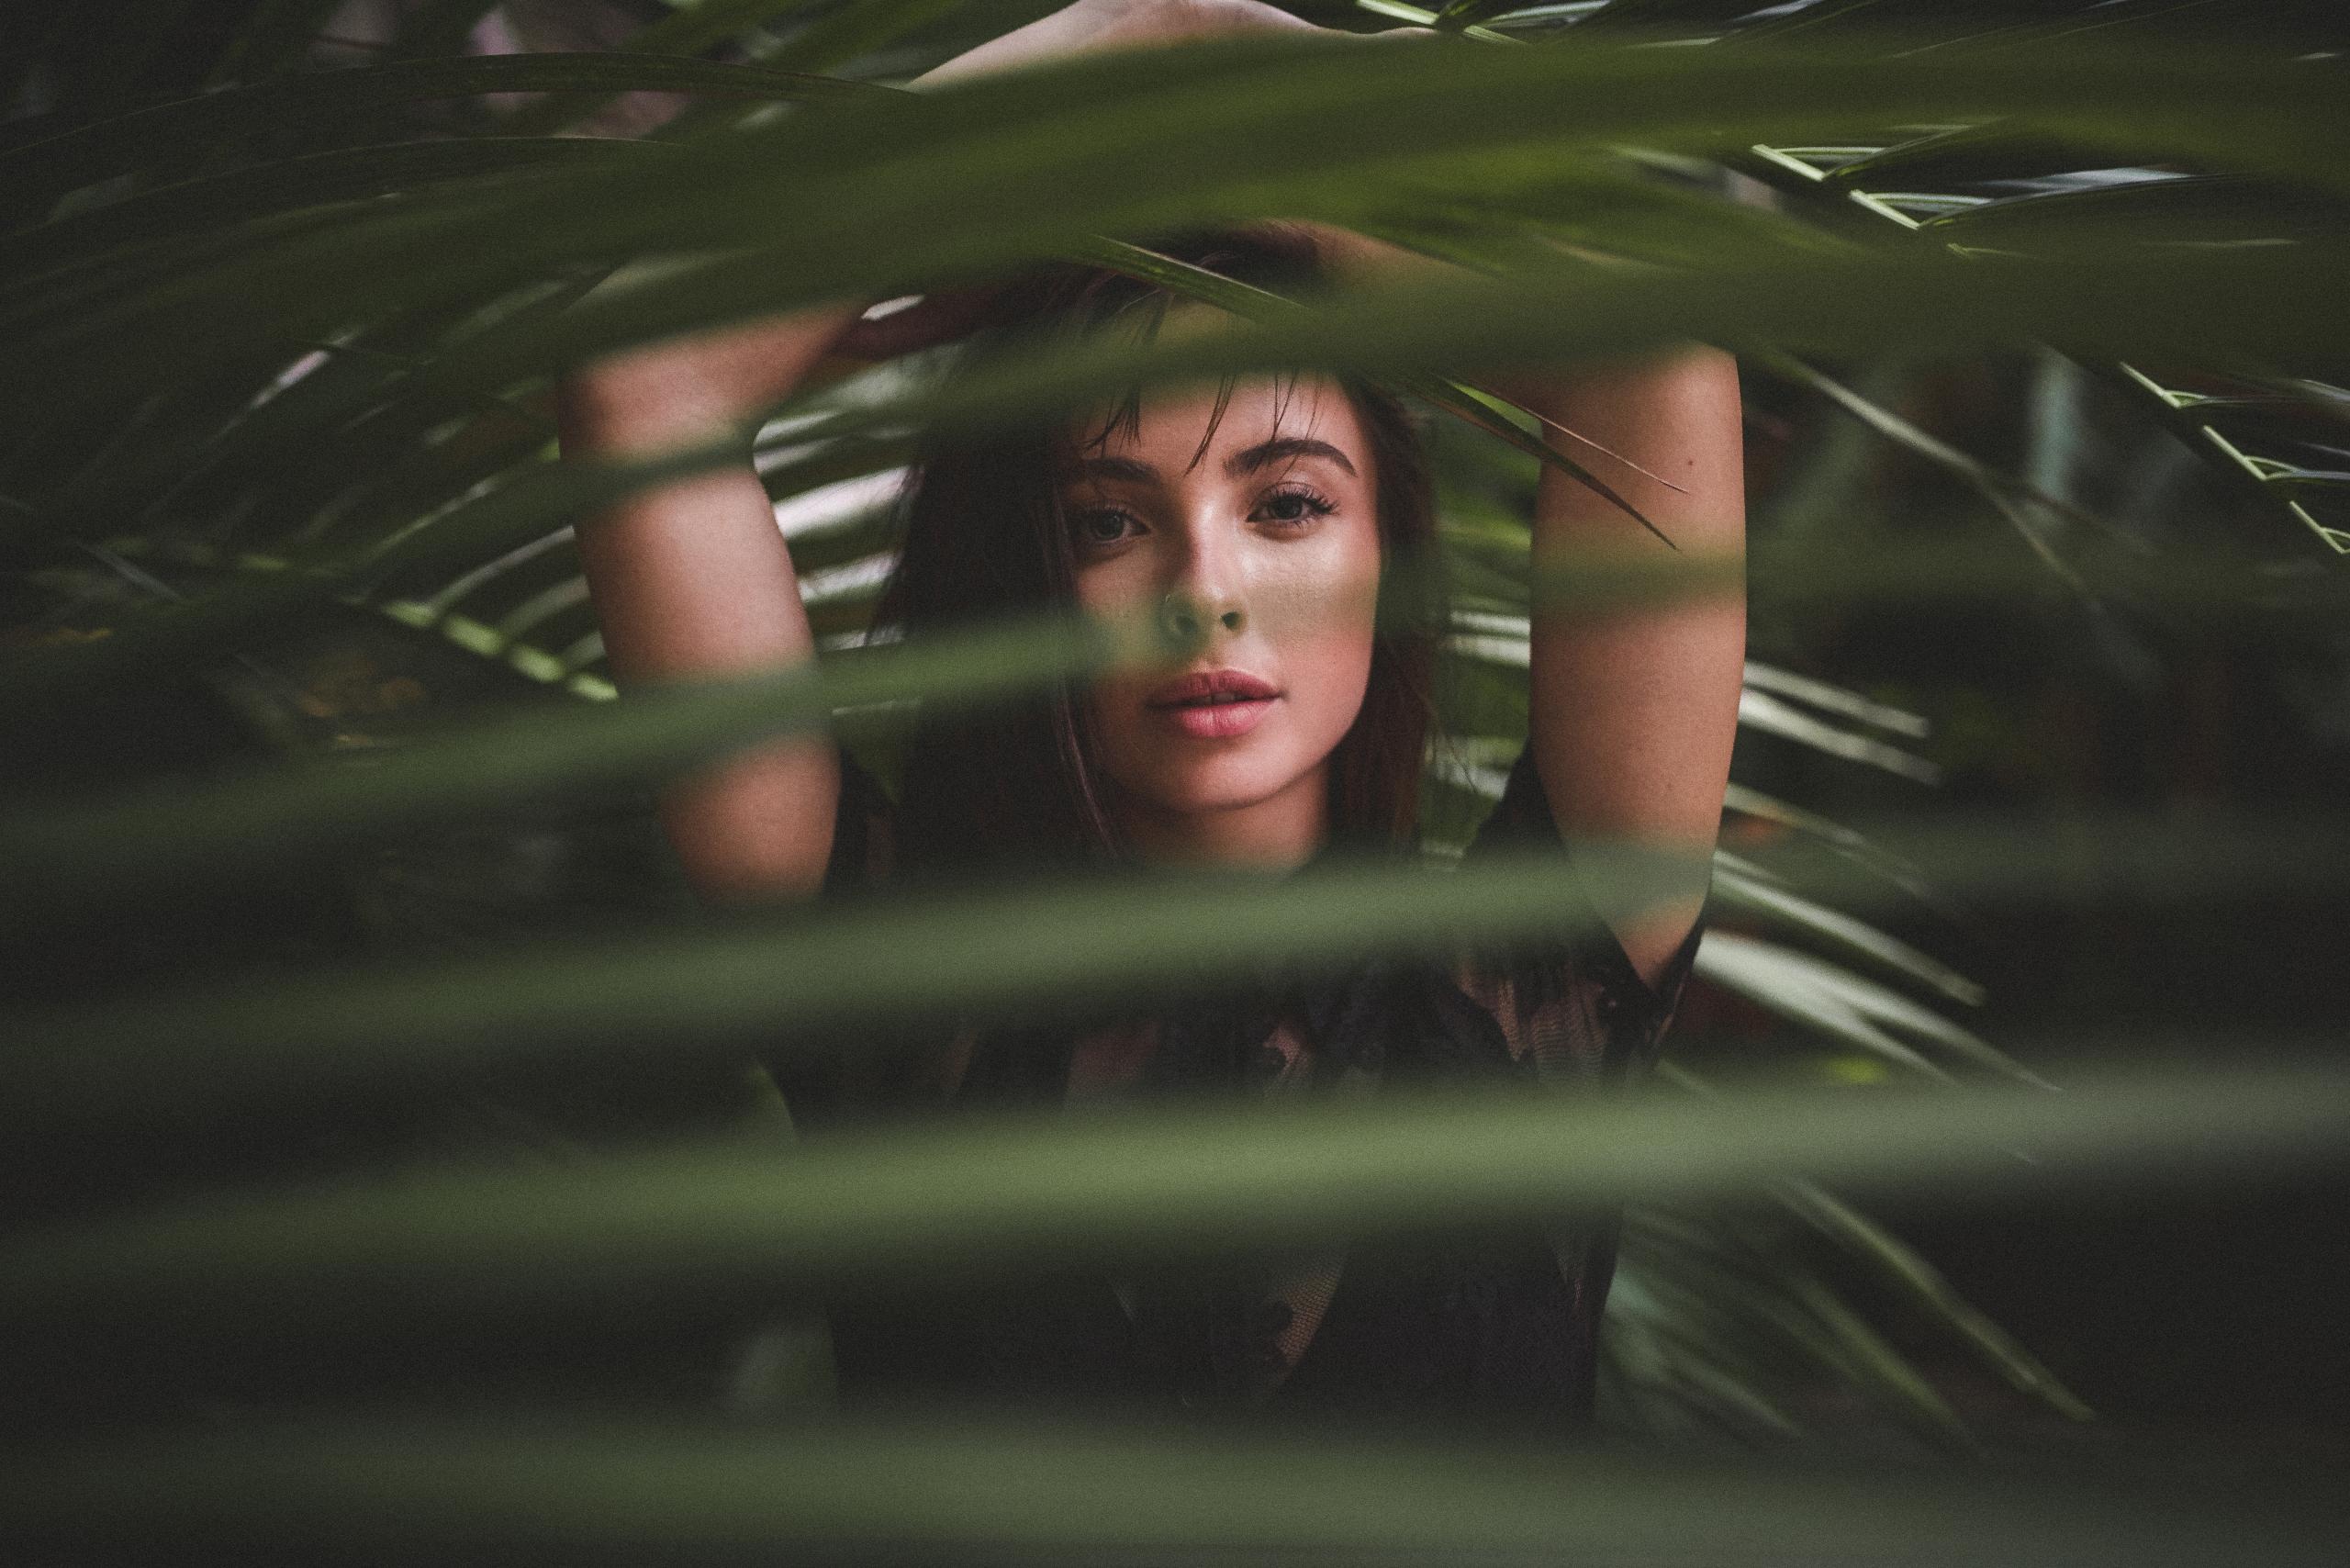 Jungle - photography, portrait - jsnliu   ello